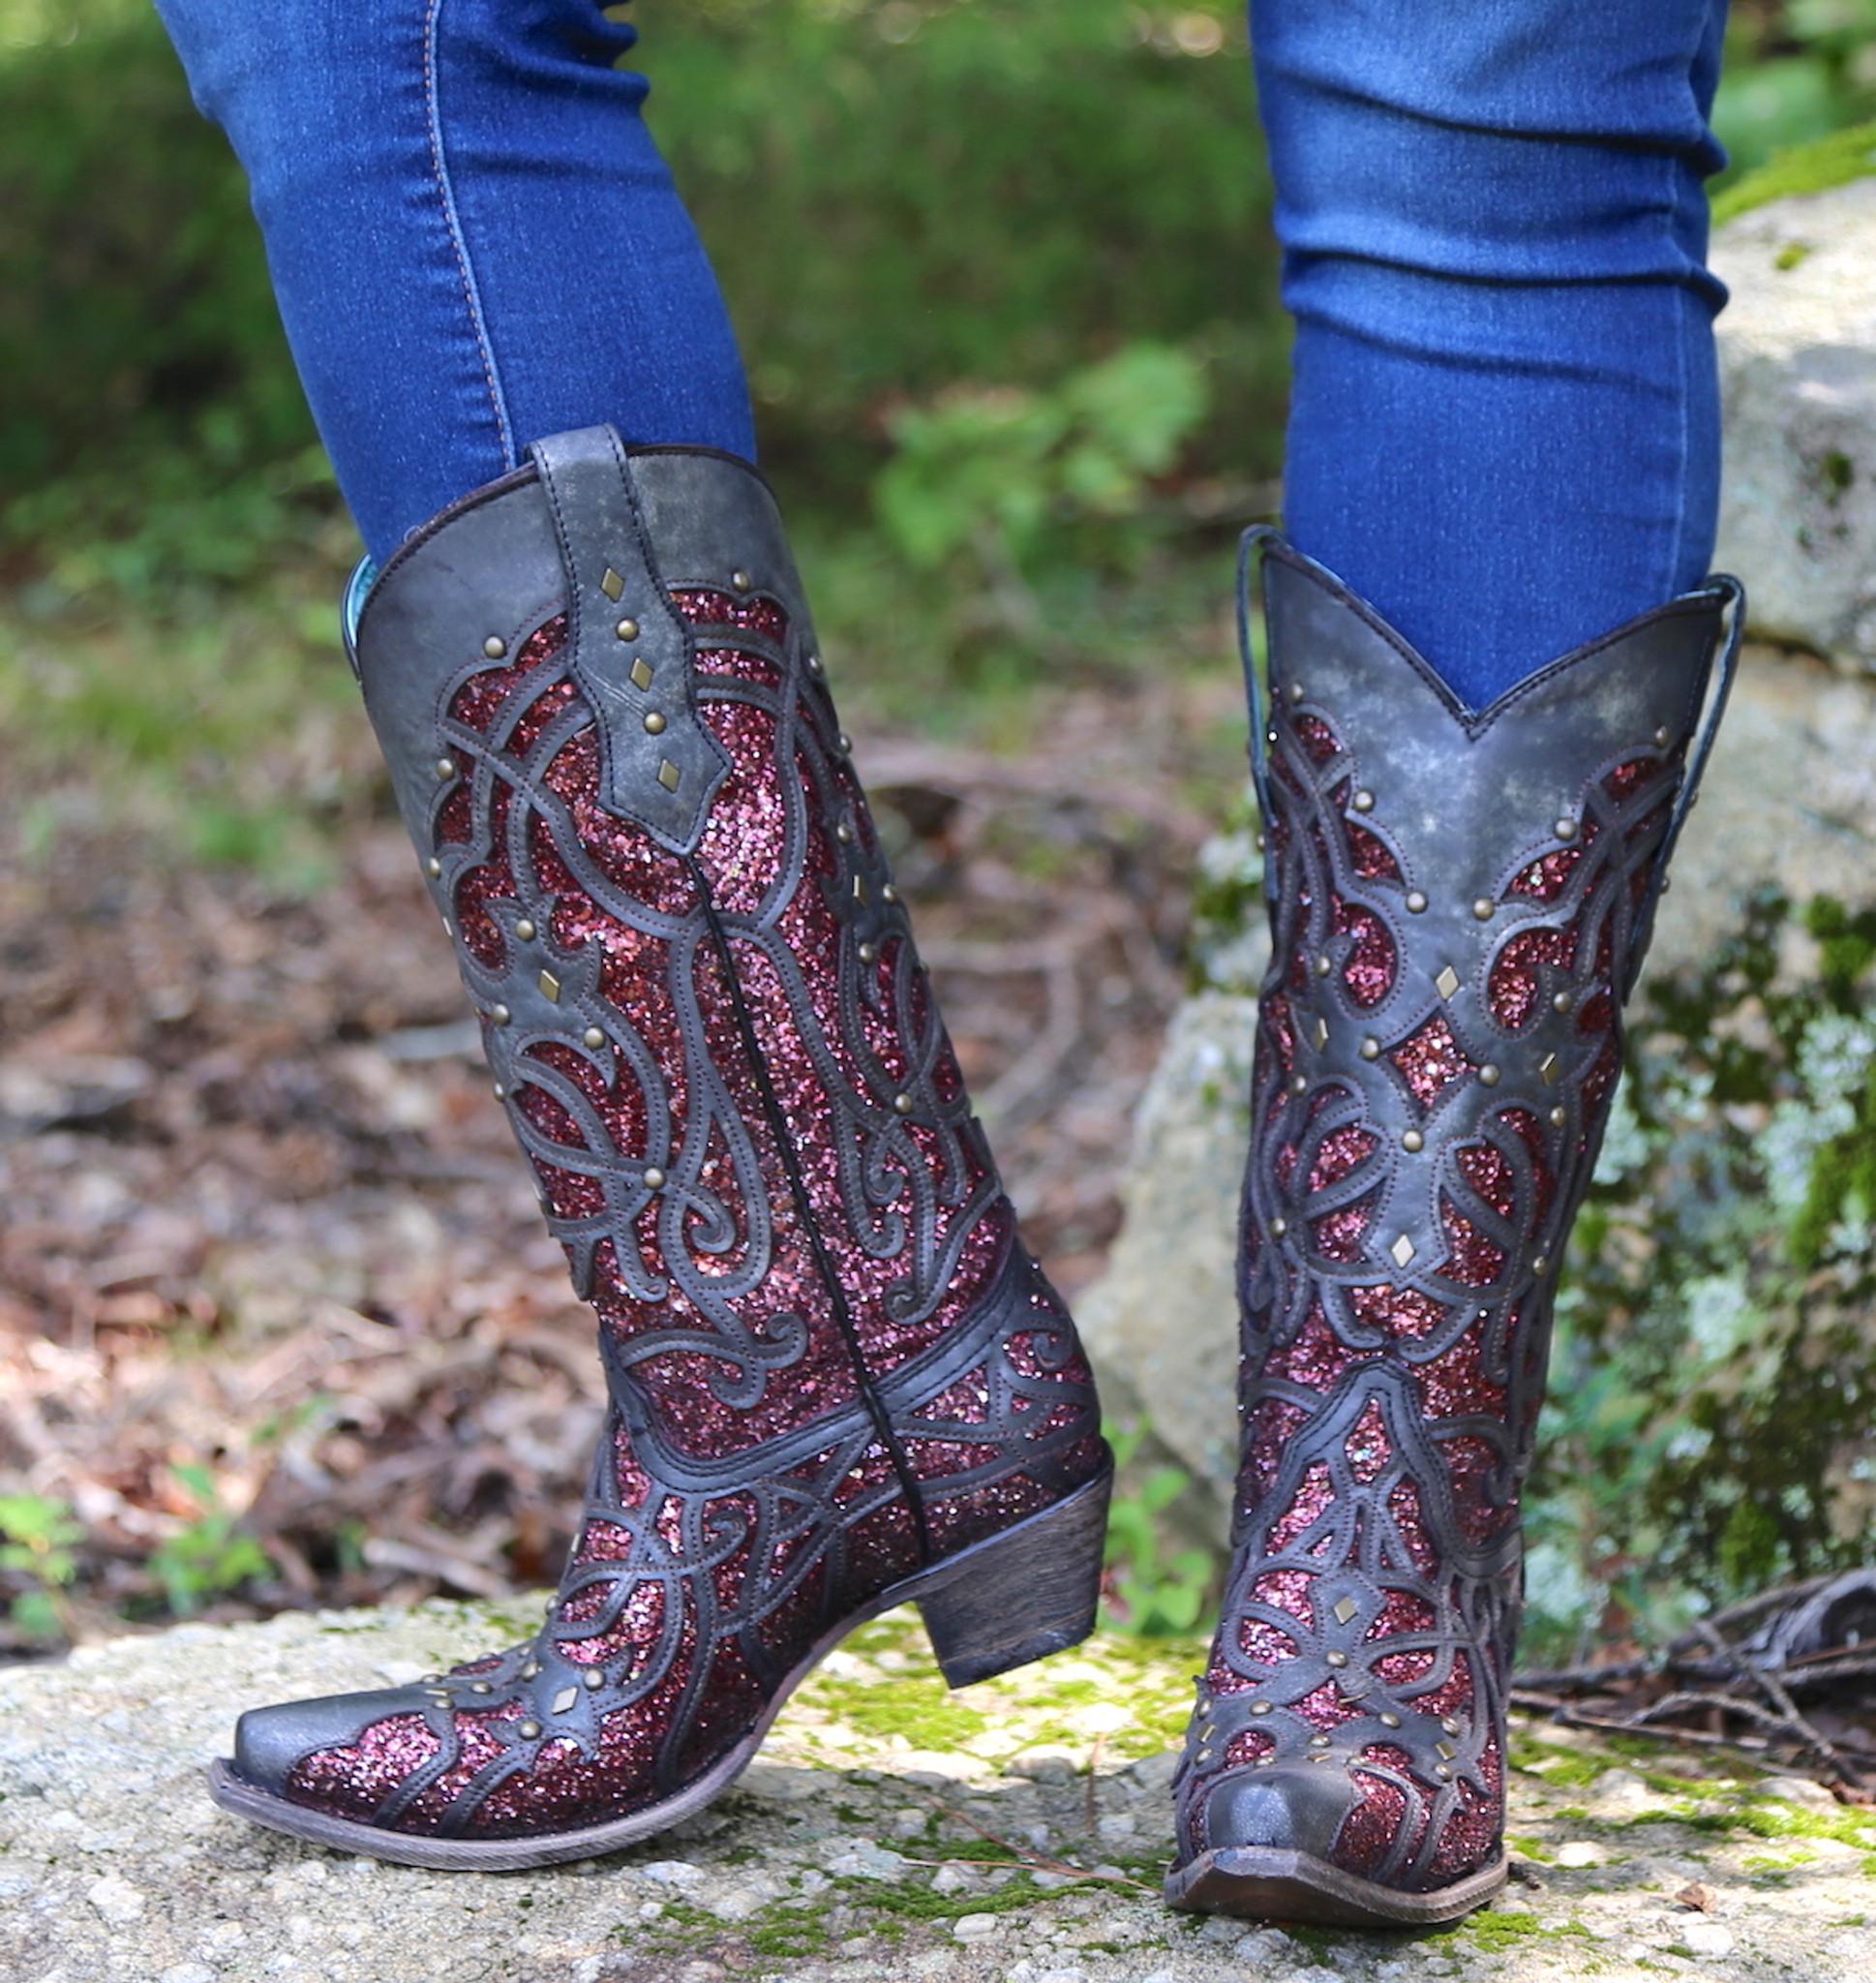 d4ea7b1efe73 Corral Black Plum Glitter Inlay and Studs Snip Toe Boots C3406 Photo